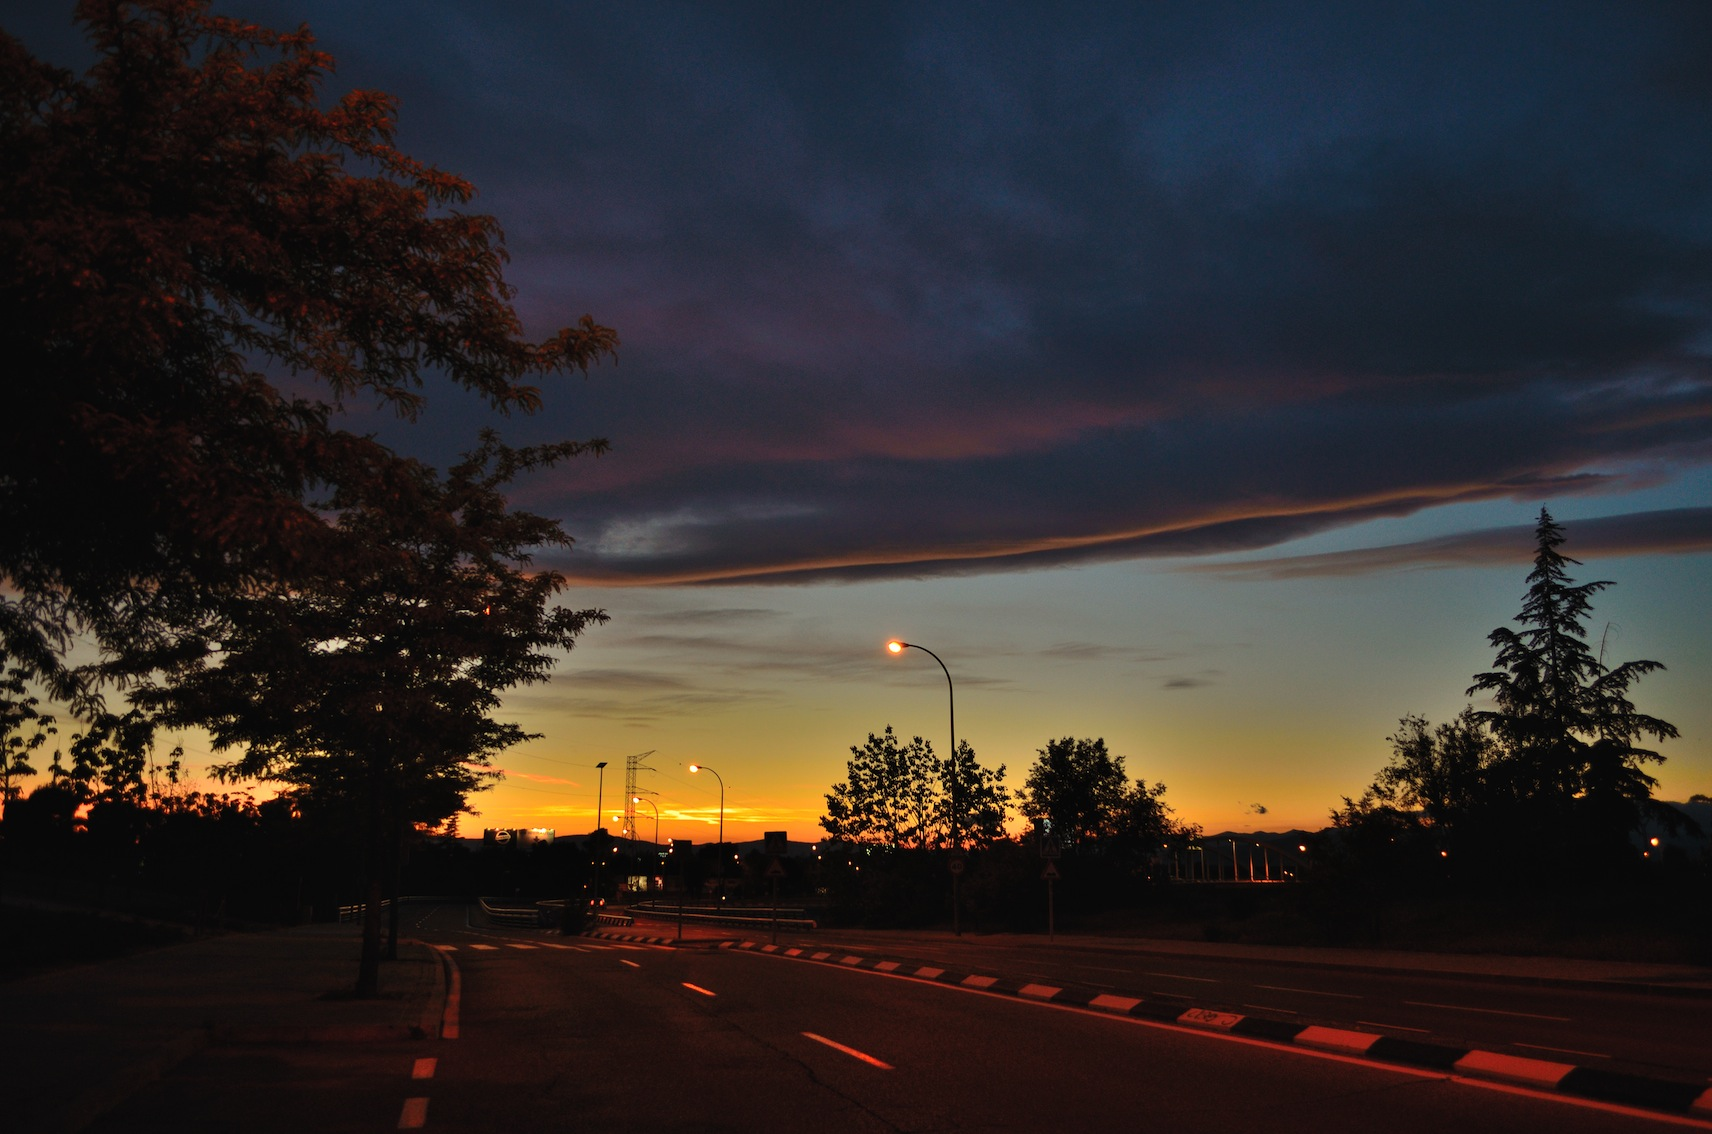 Cloud by dusk in urban road